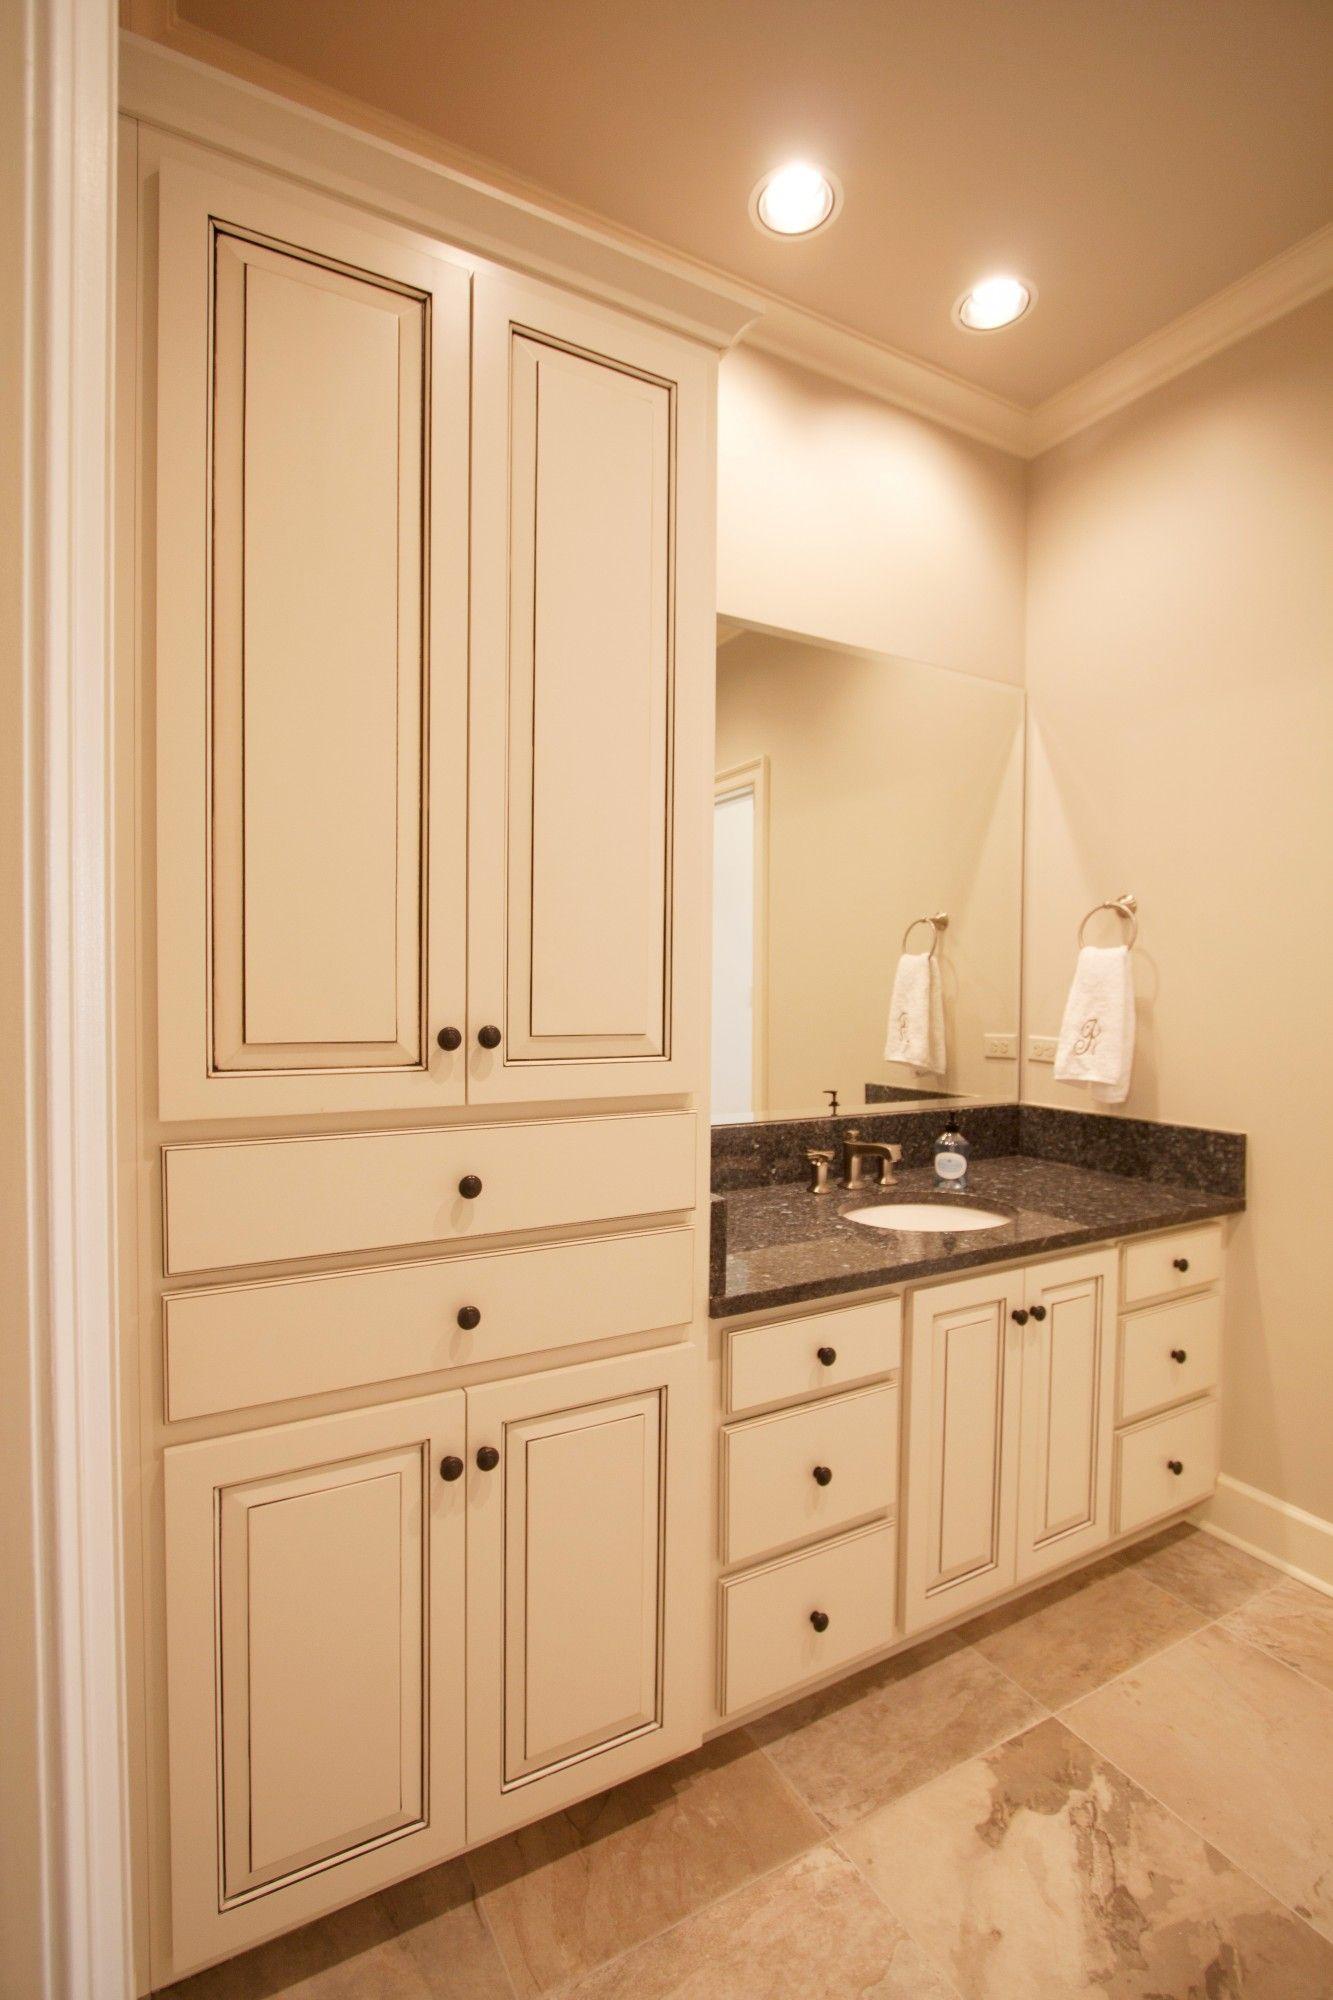 Best Kitchen Gallery: Glazed Bathroom Vanity Cabi S Northshore Millwork Llc of Accent Flat Kitchen Cabinet Door on cal-ite.com